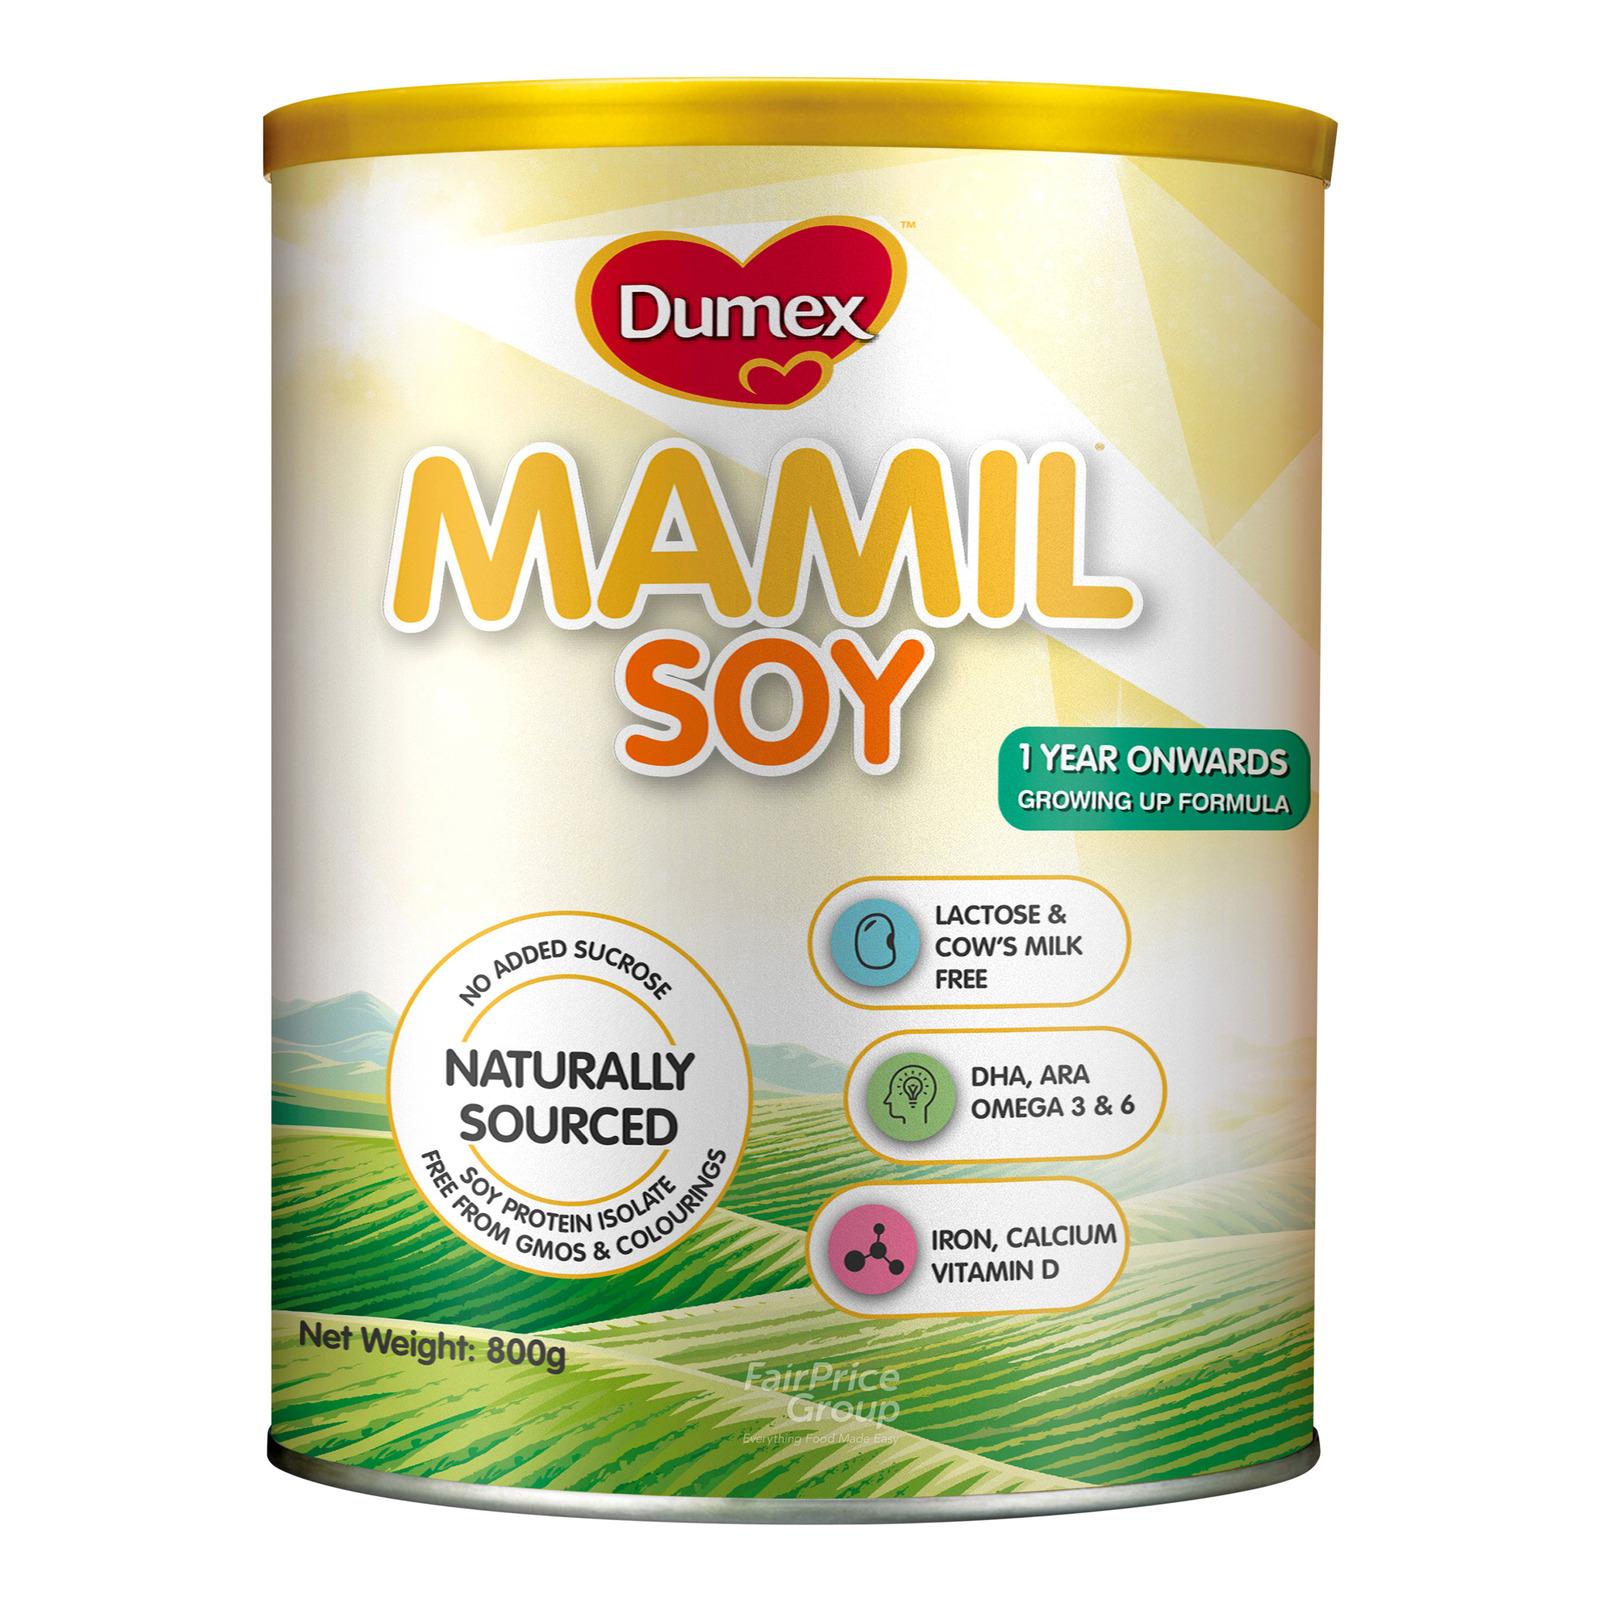 Dumex Mamil Gold Soy Growing Up Milk Formula